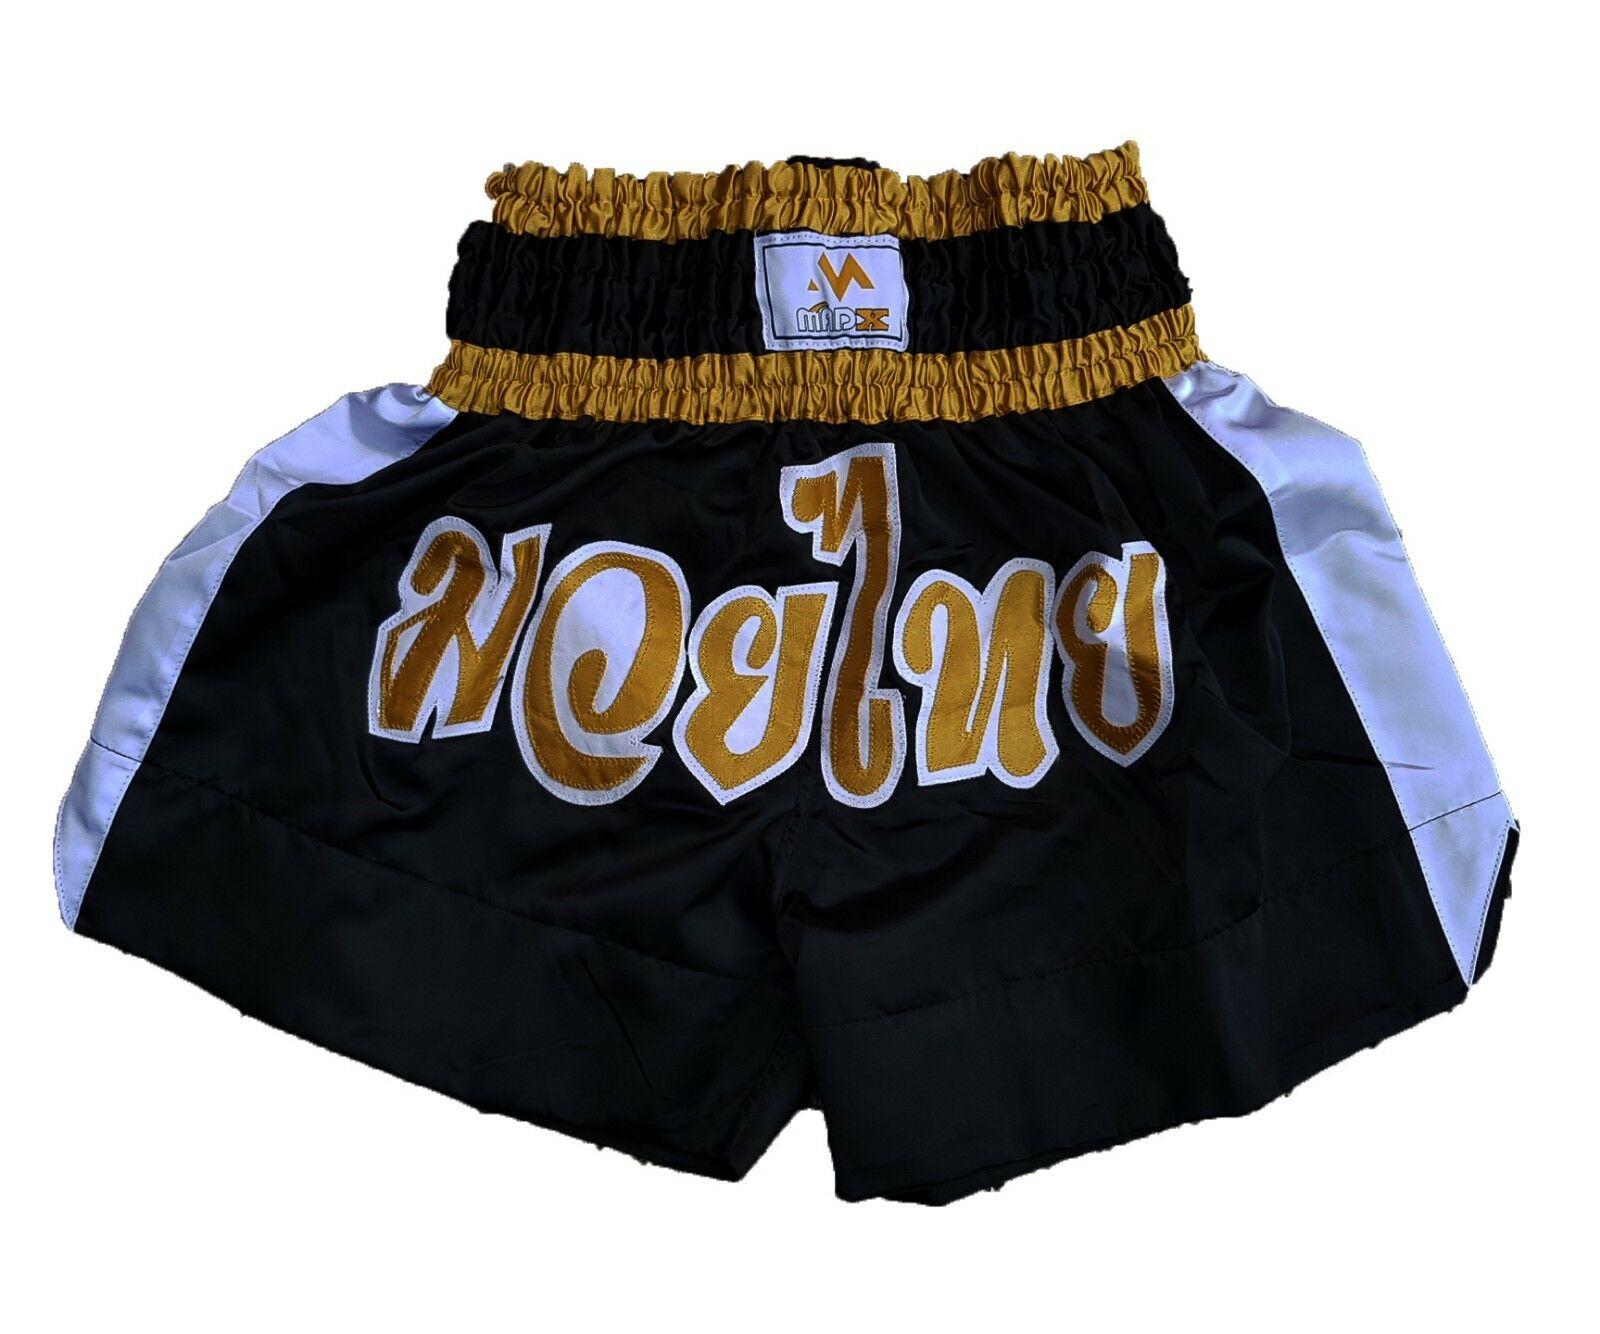 Islero Muay Thai Kampf Kickboxen Shorts Mma Ringen Kampfsport Gang UFC